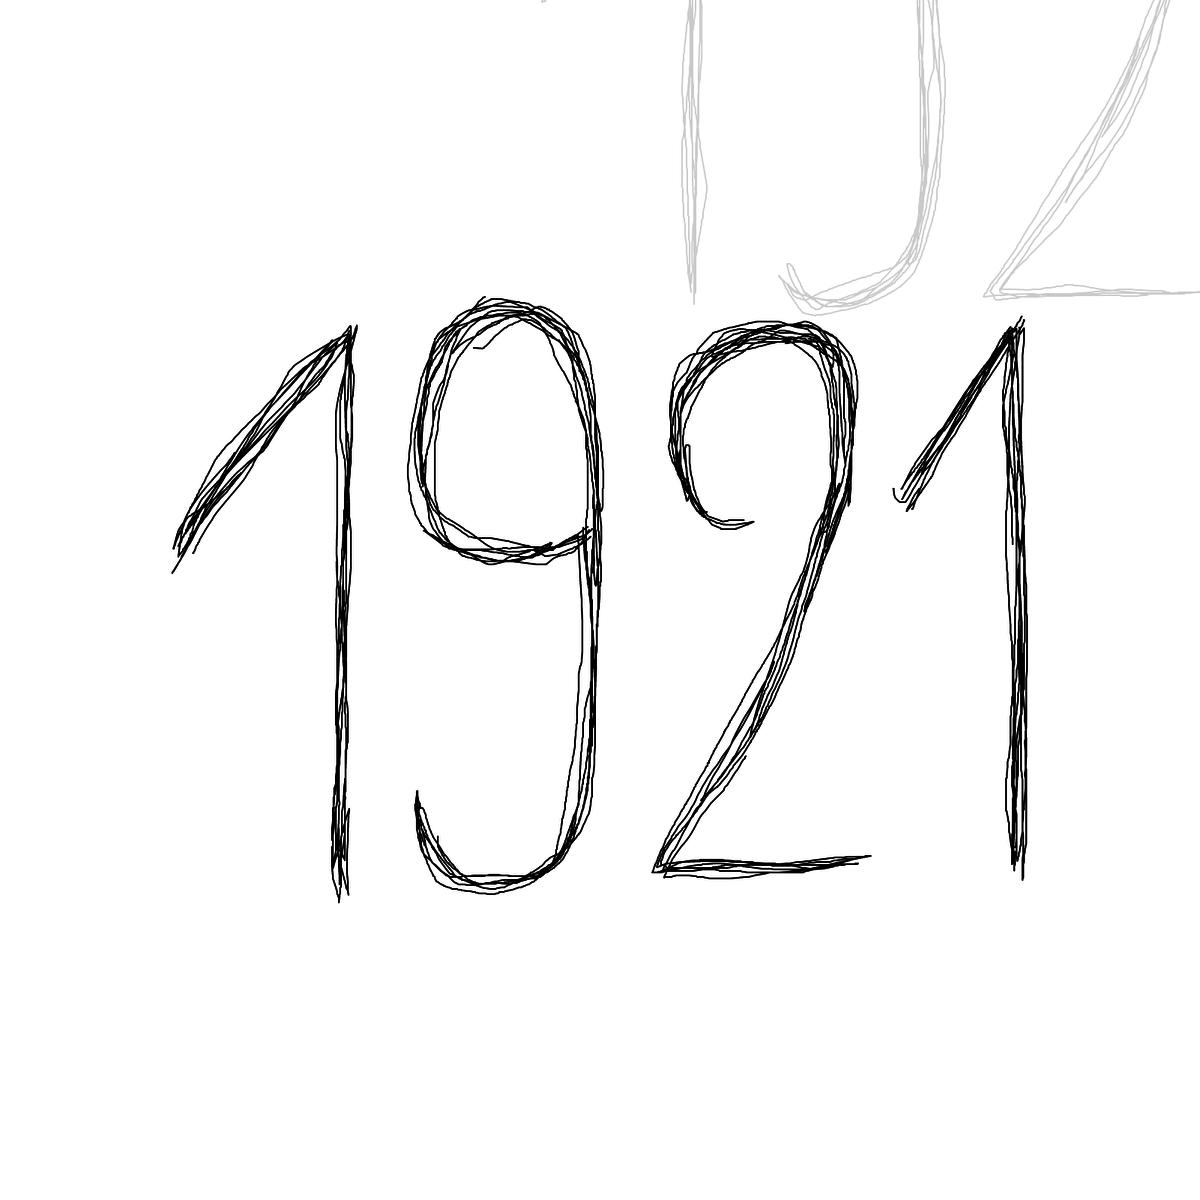 BAAAM drawing#18979 lat:50.2635498046875000lng: 19.0240097045898440